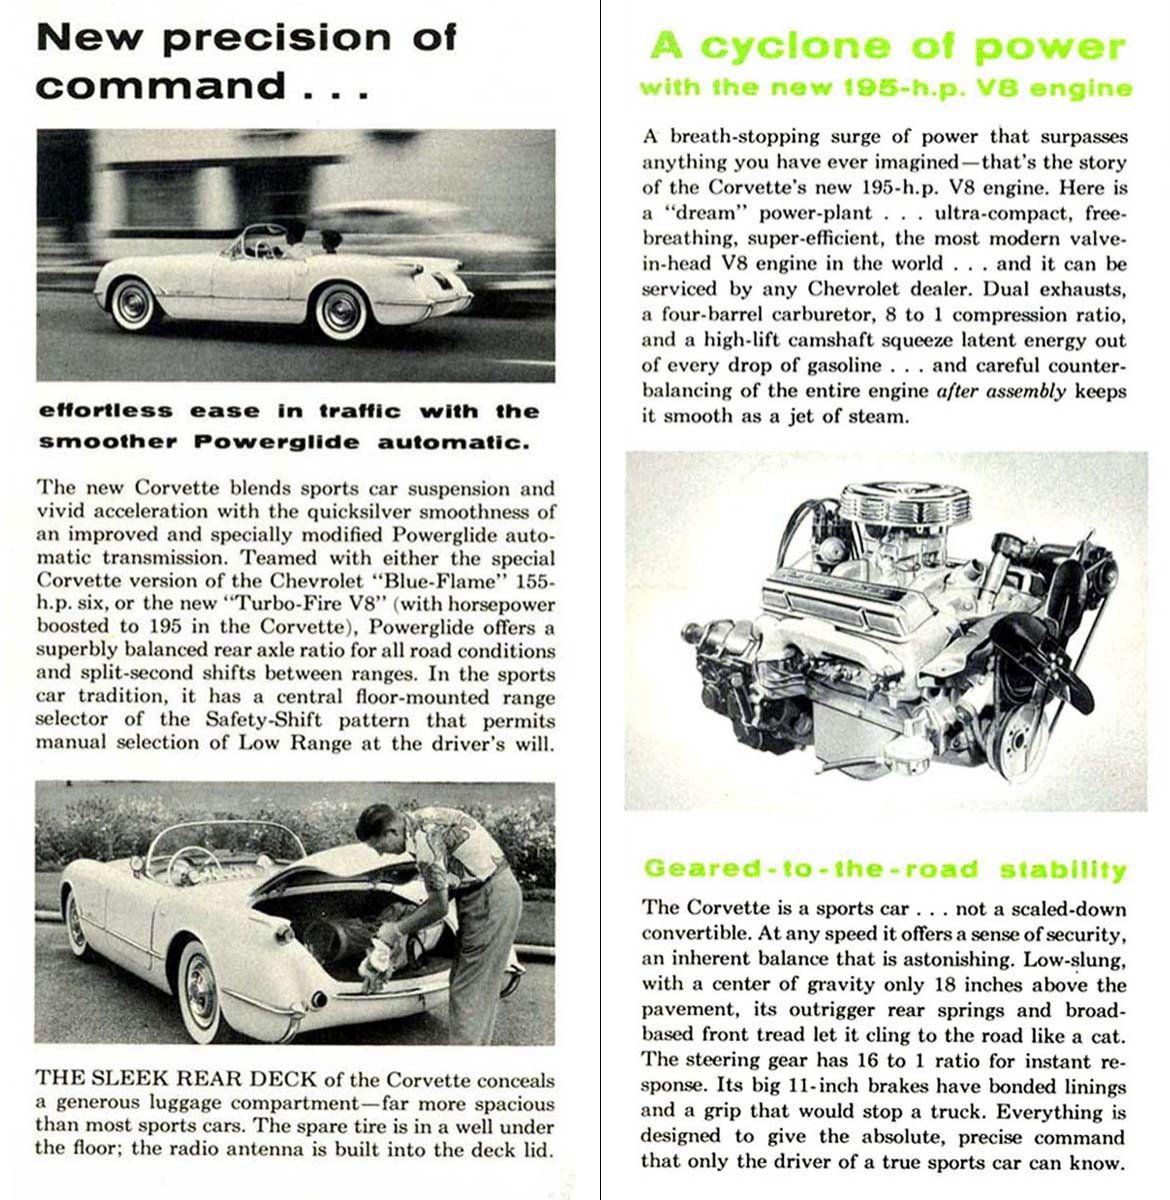 1955_Corvette_Foldout_Brochure_1-4_02.jpg